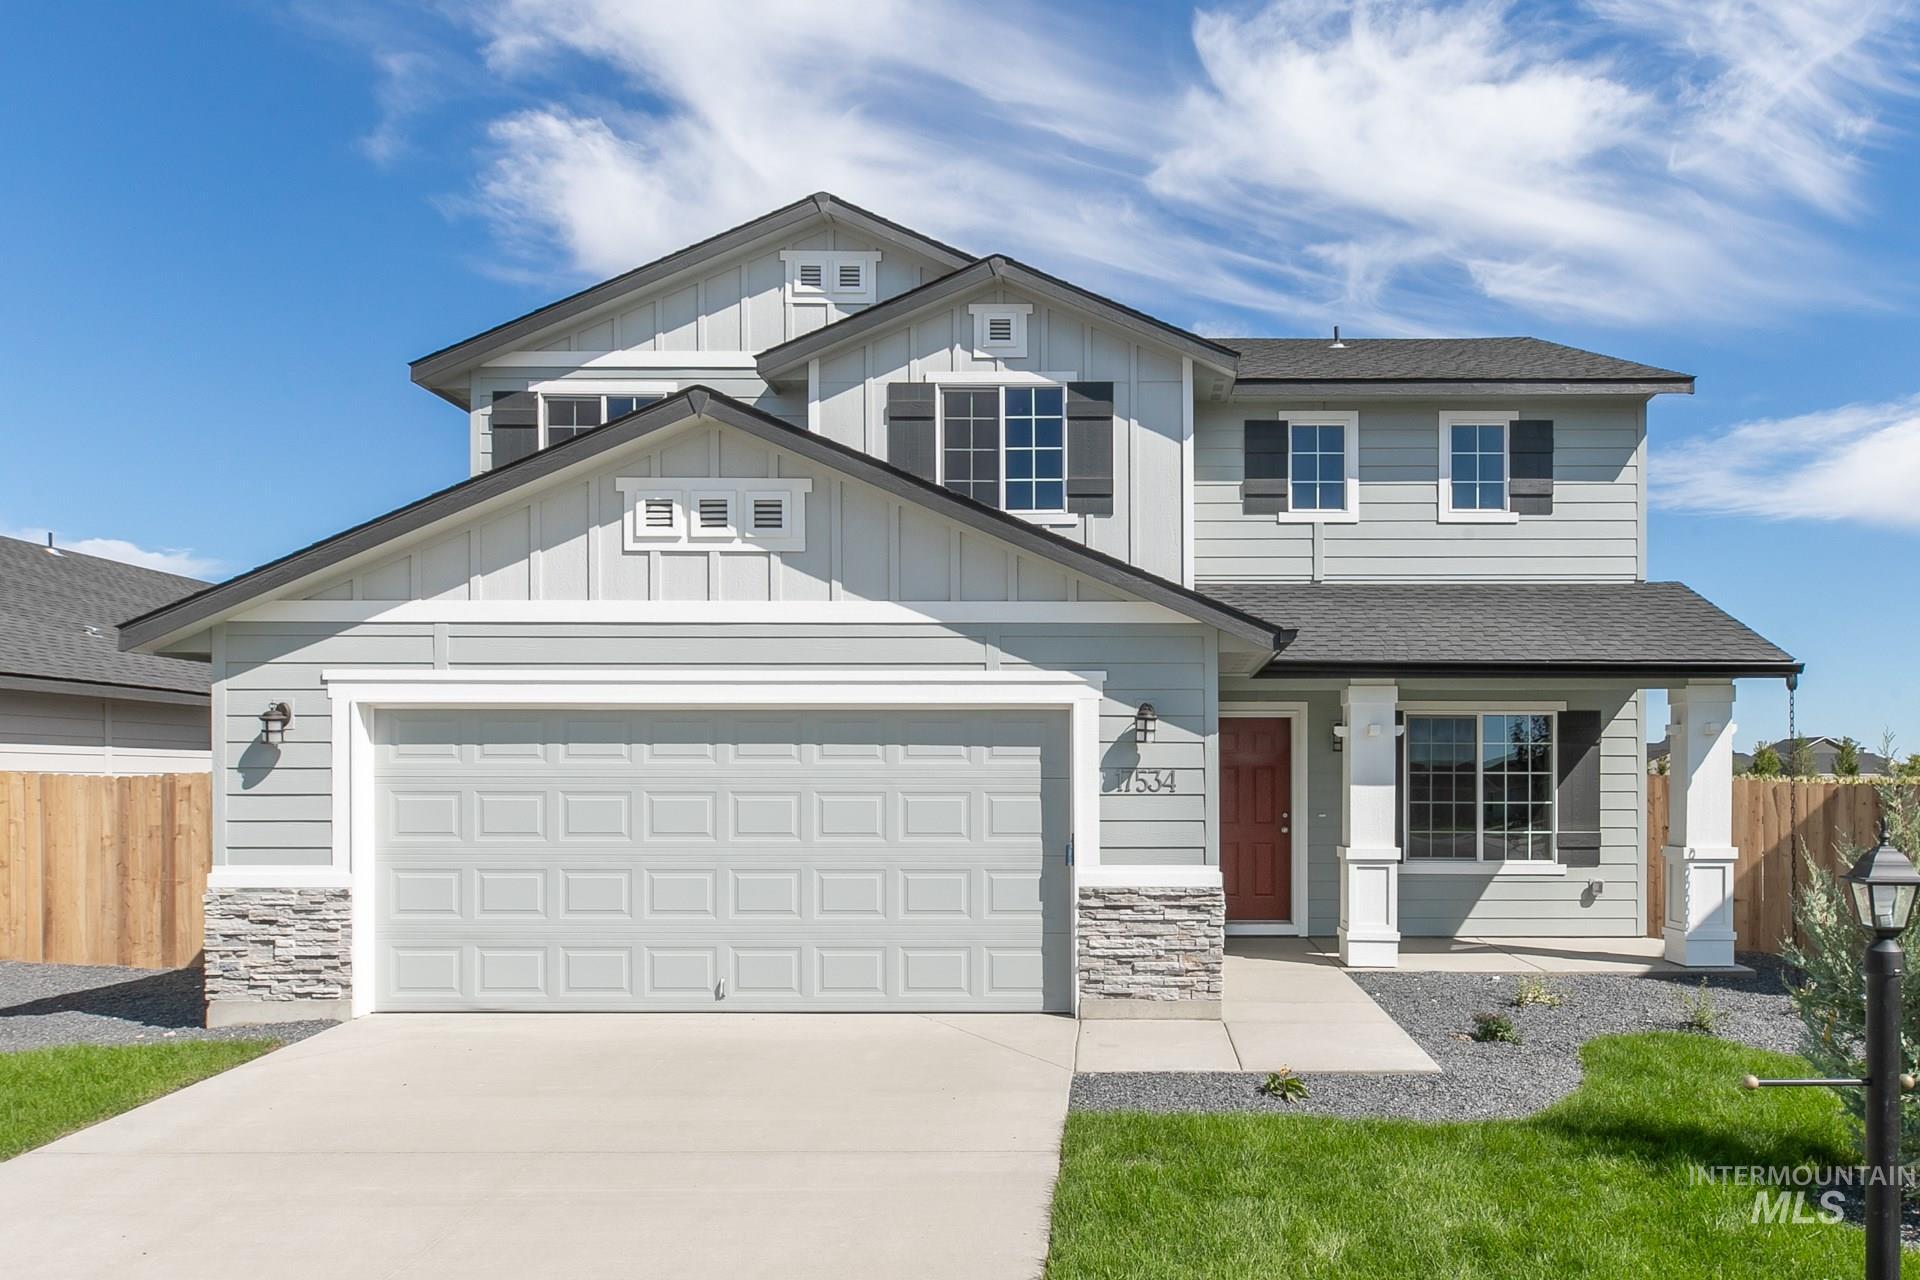 13633 Bascom St Property Photo - Caldwell, ID real estate listing